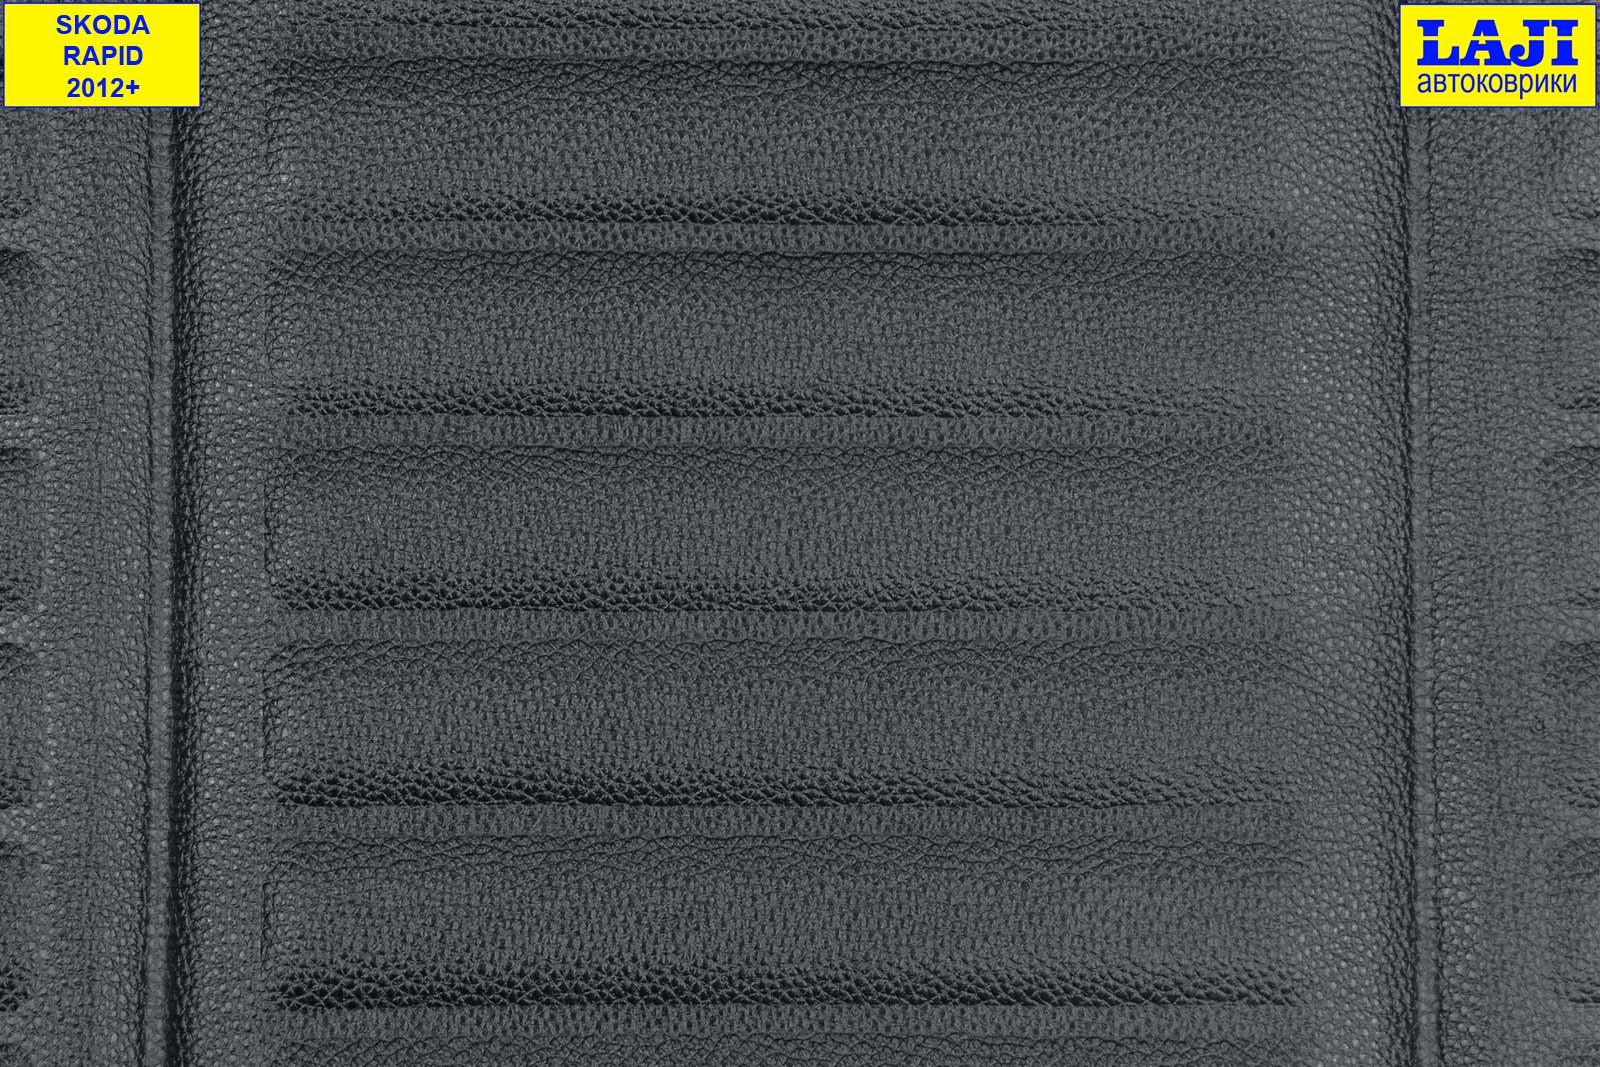 3D коврик в багажник Skoda Rapid 1 2012-2020 6